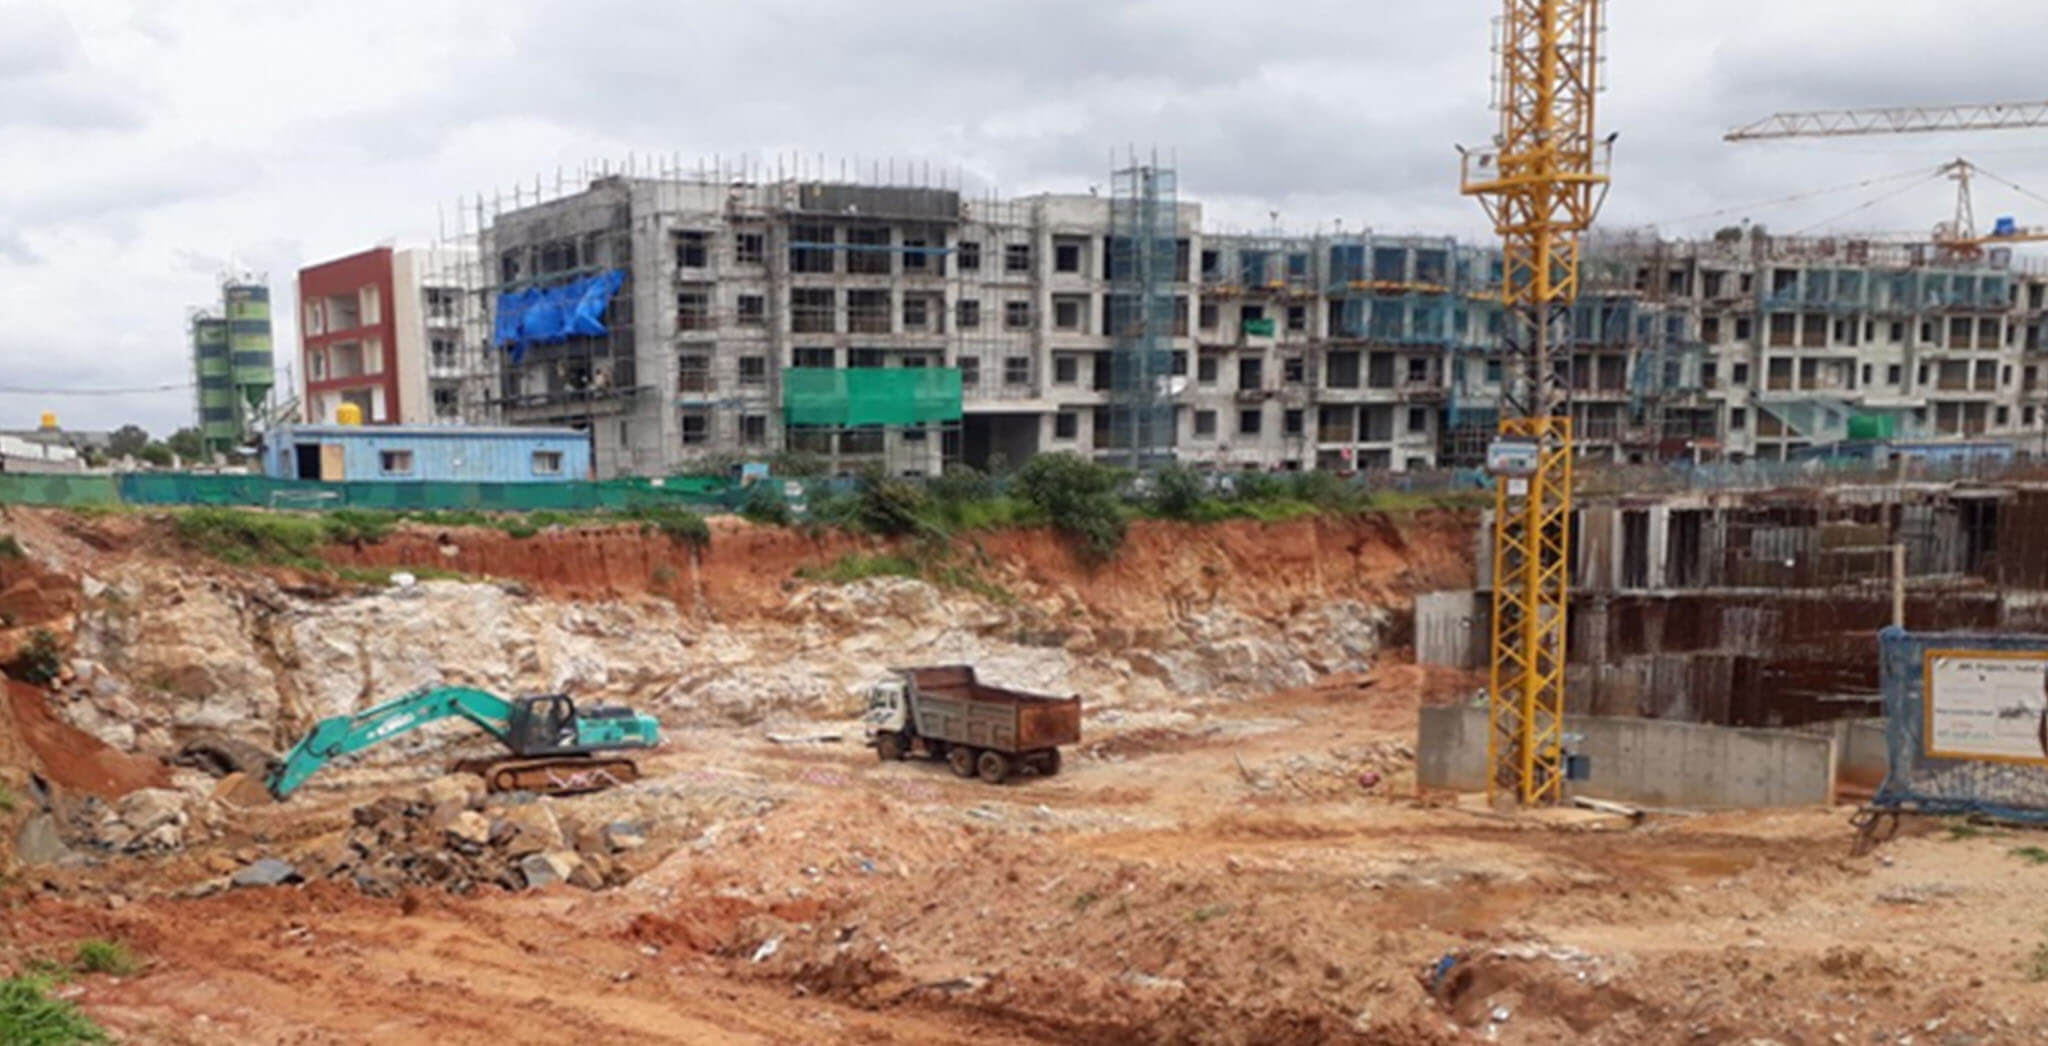 Aug 2020 - C & H Blocks: Excavation work-in-progress